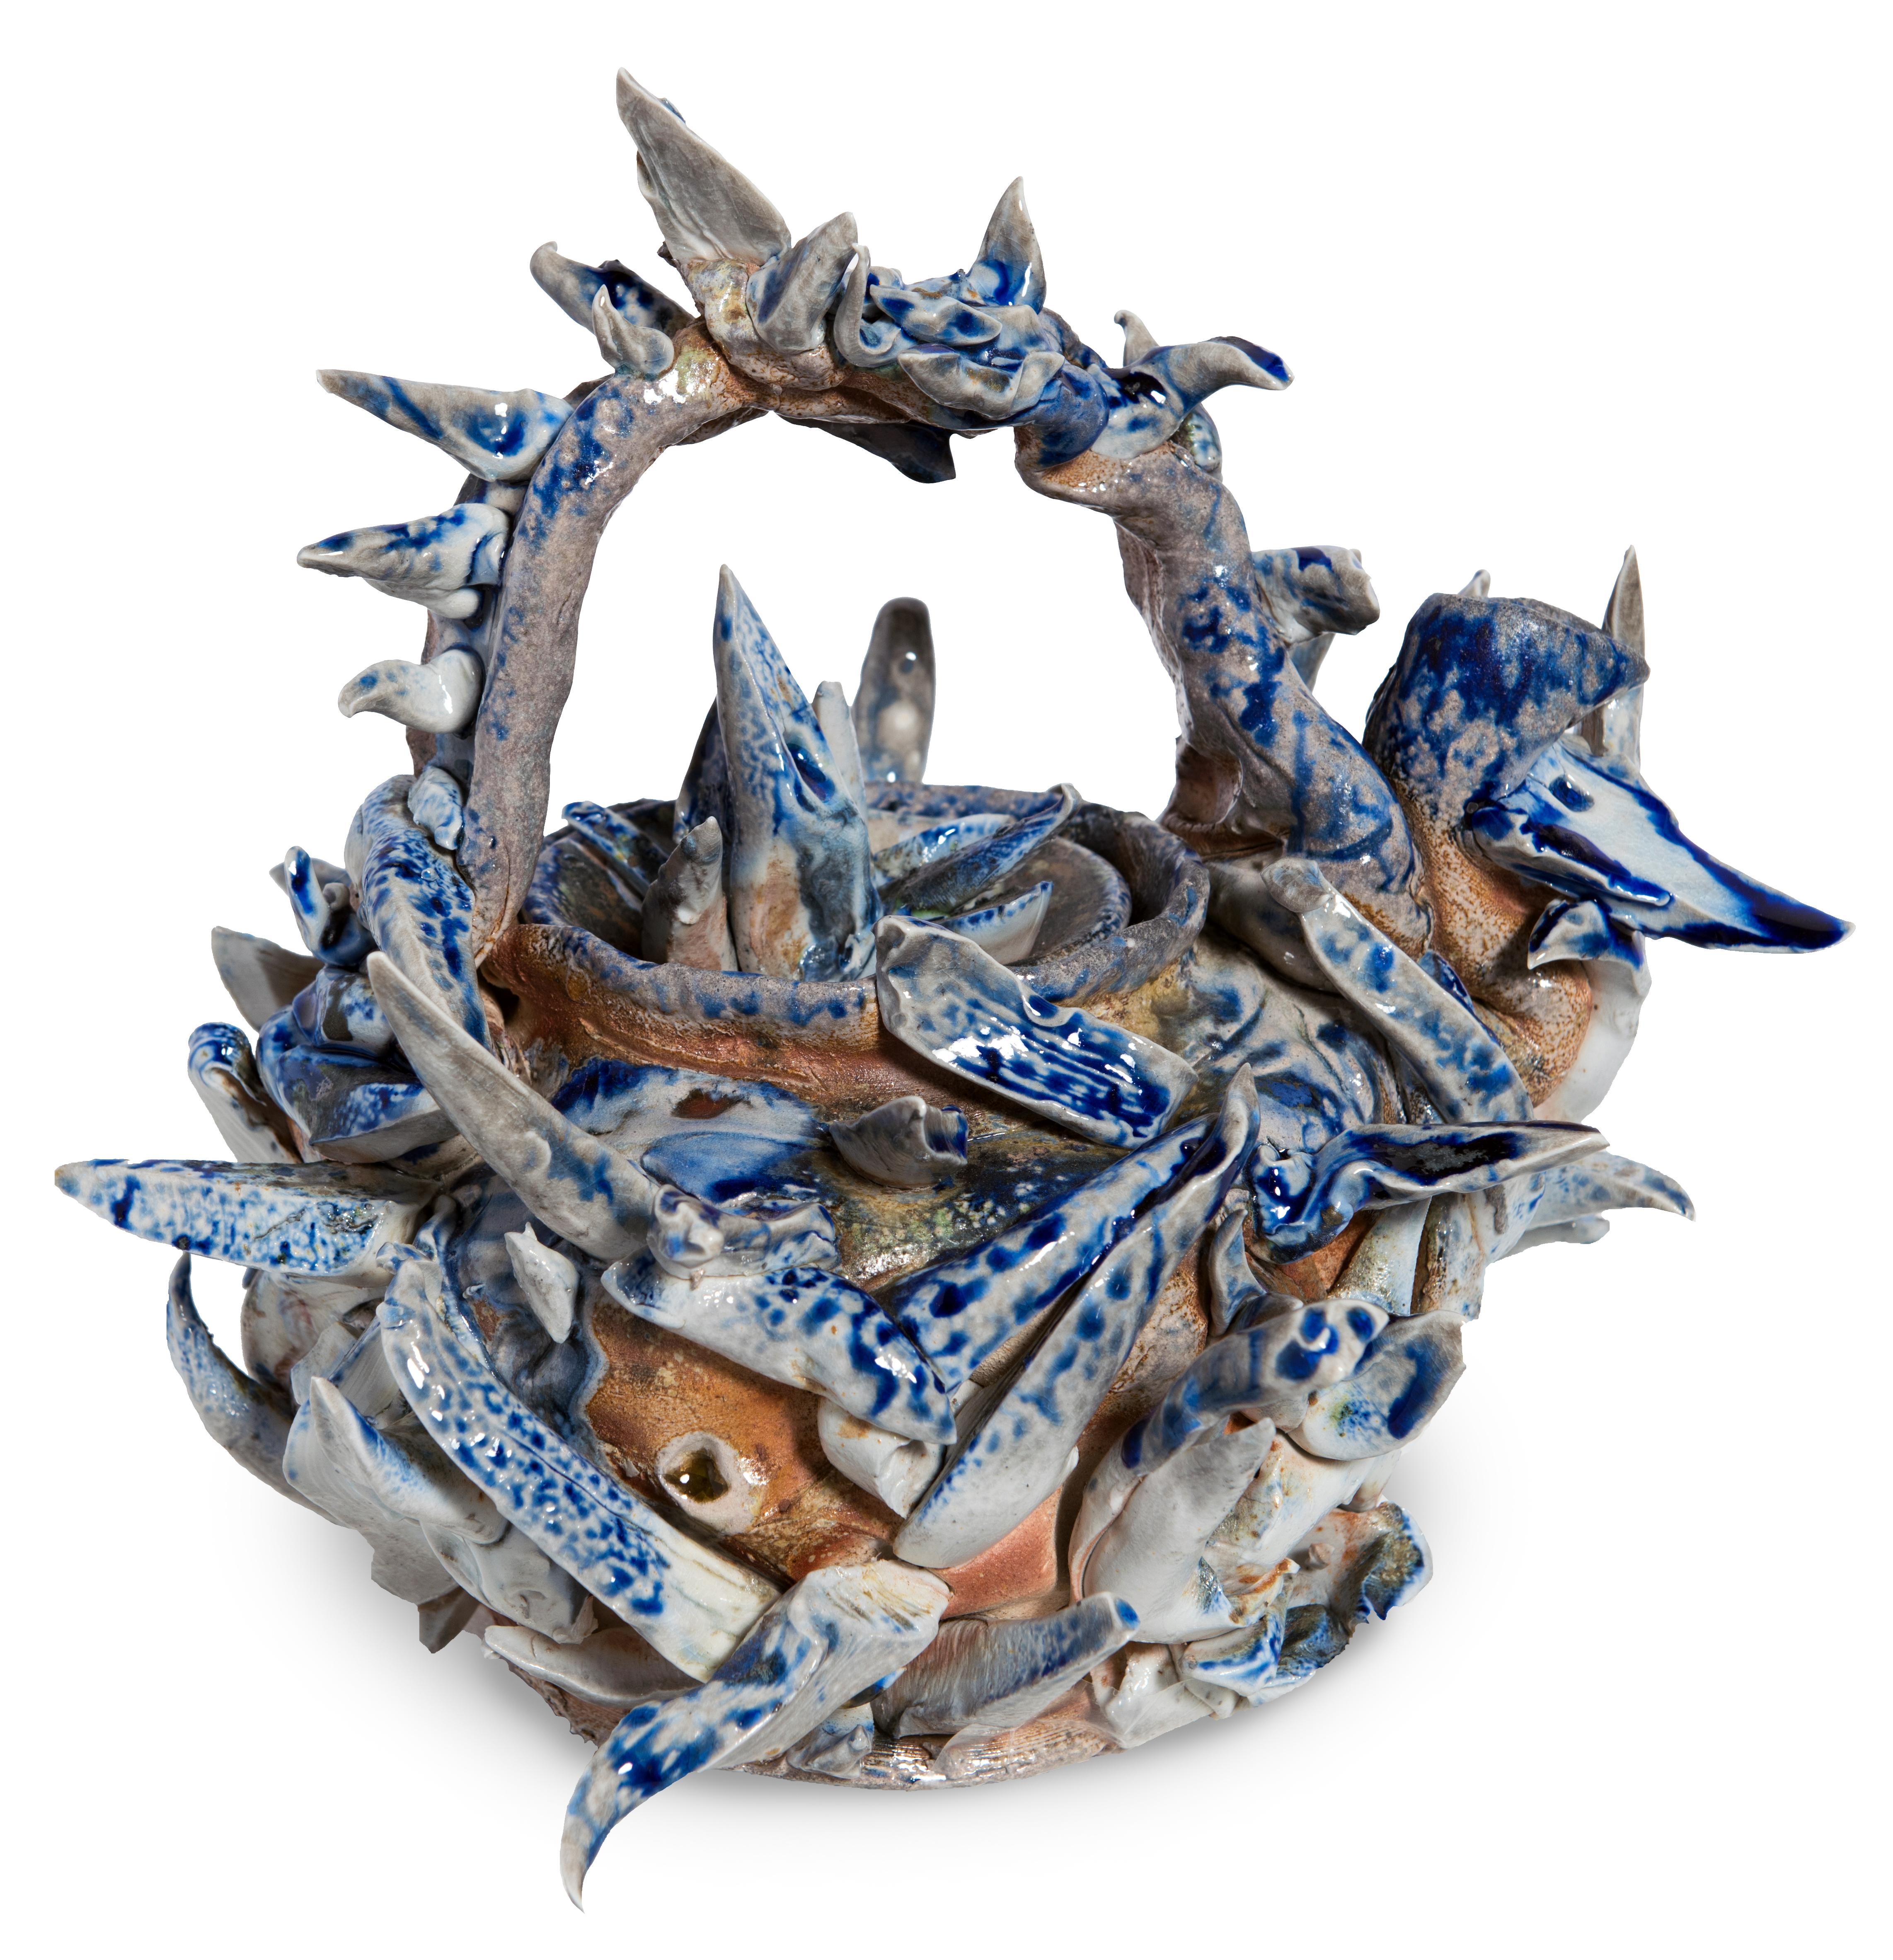 Spondylus Teapot #1 porcelain, wood ash, glass and metal oxide ceramic artwork by Jeff Whyman